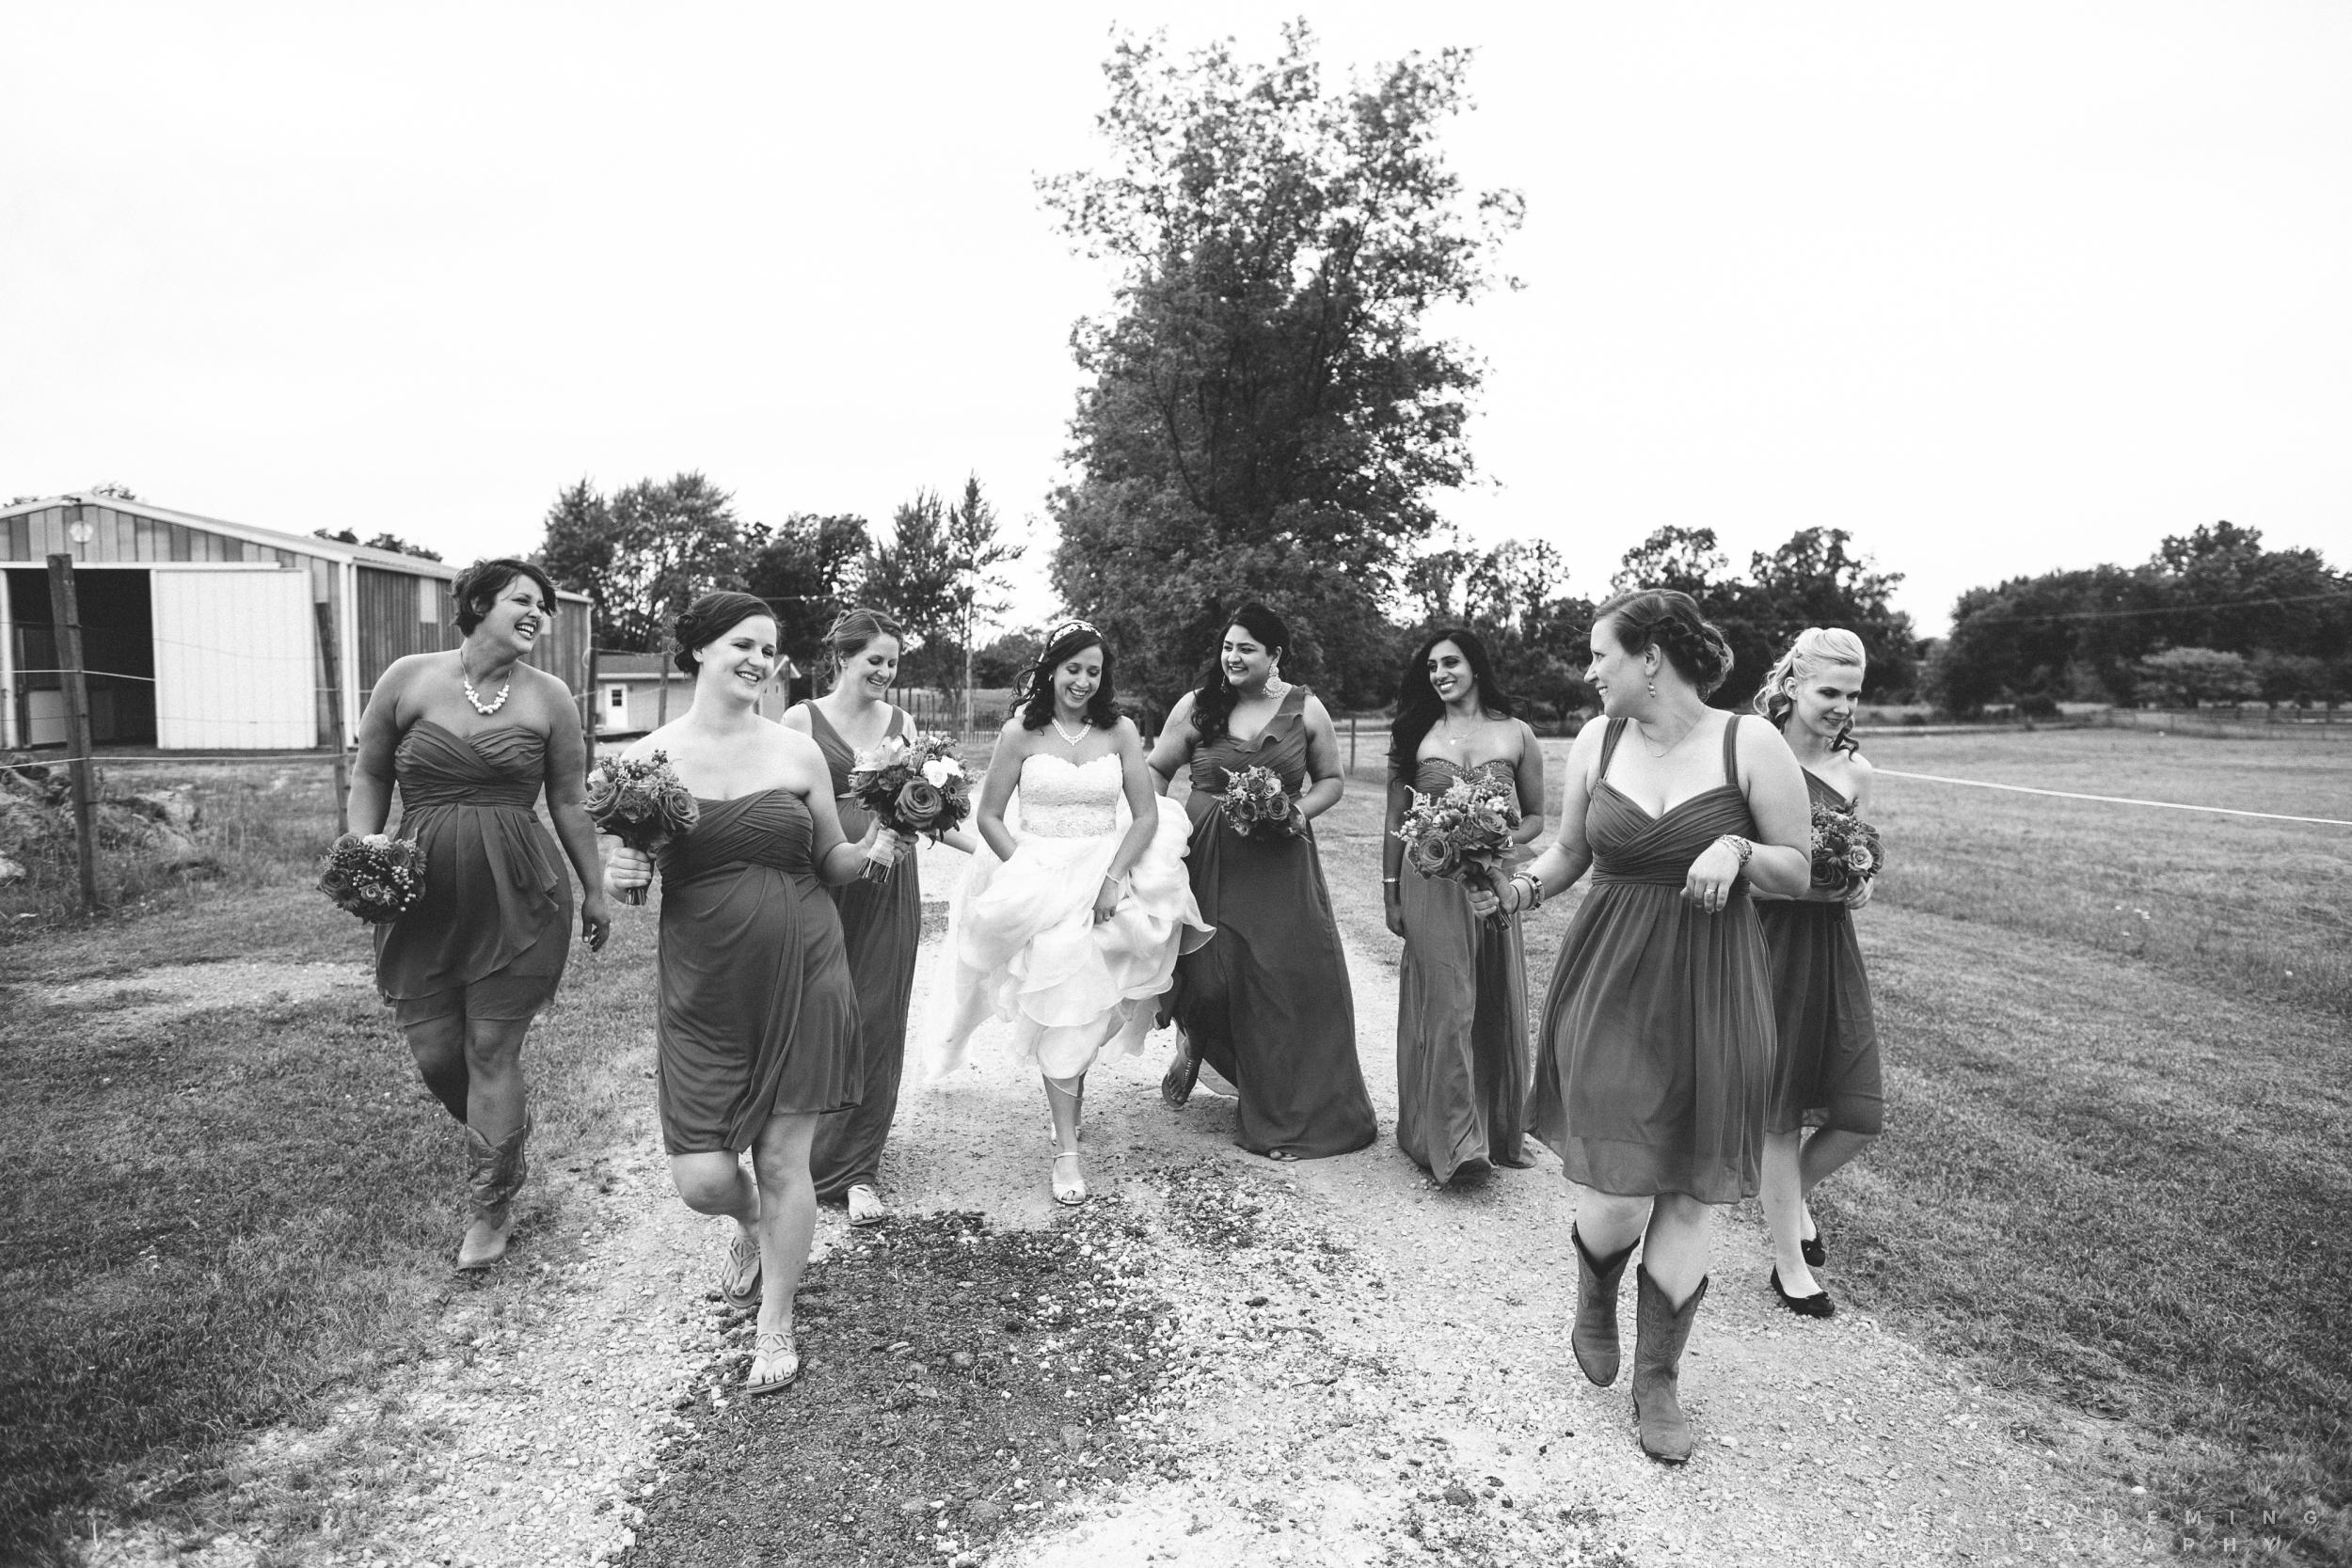 crete_IL_farm_wedding_photographer_0014.jpg